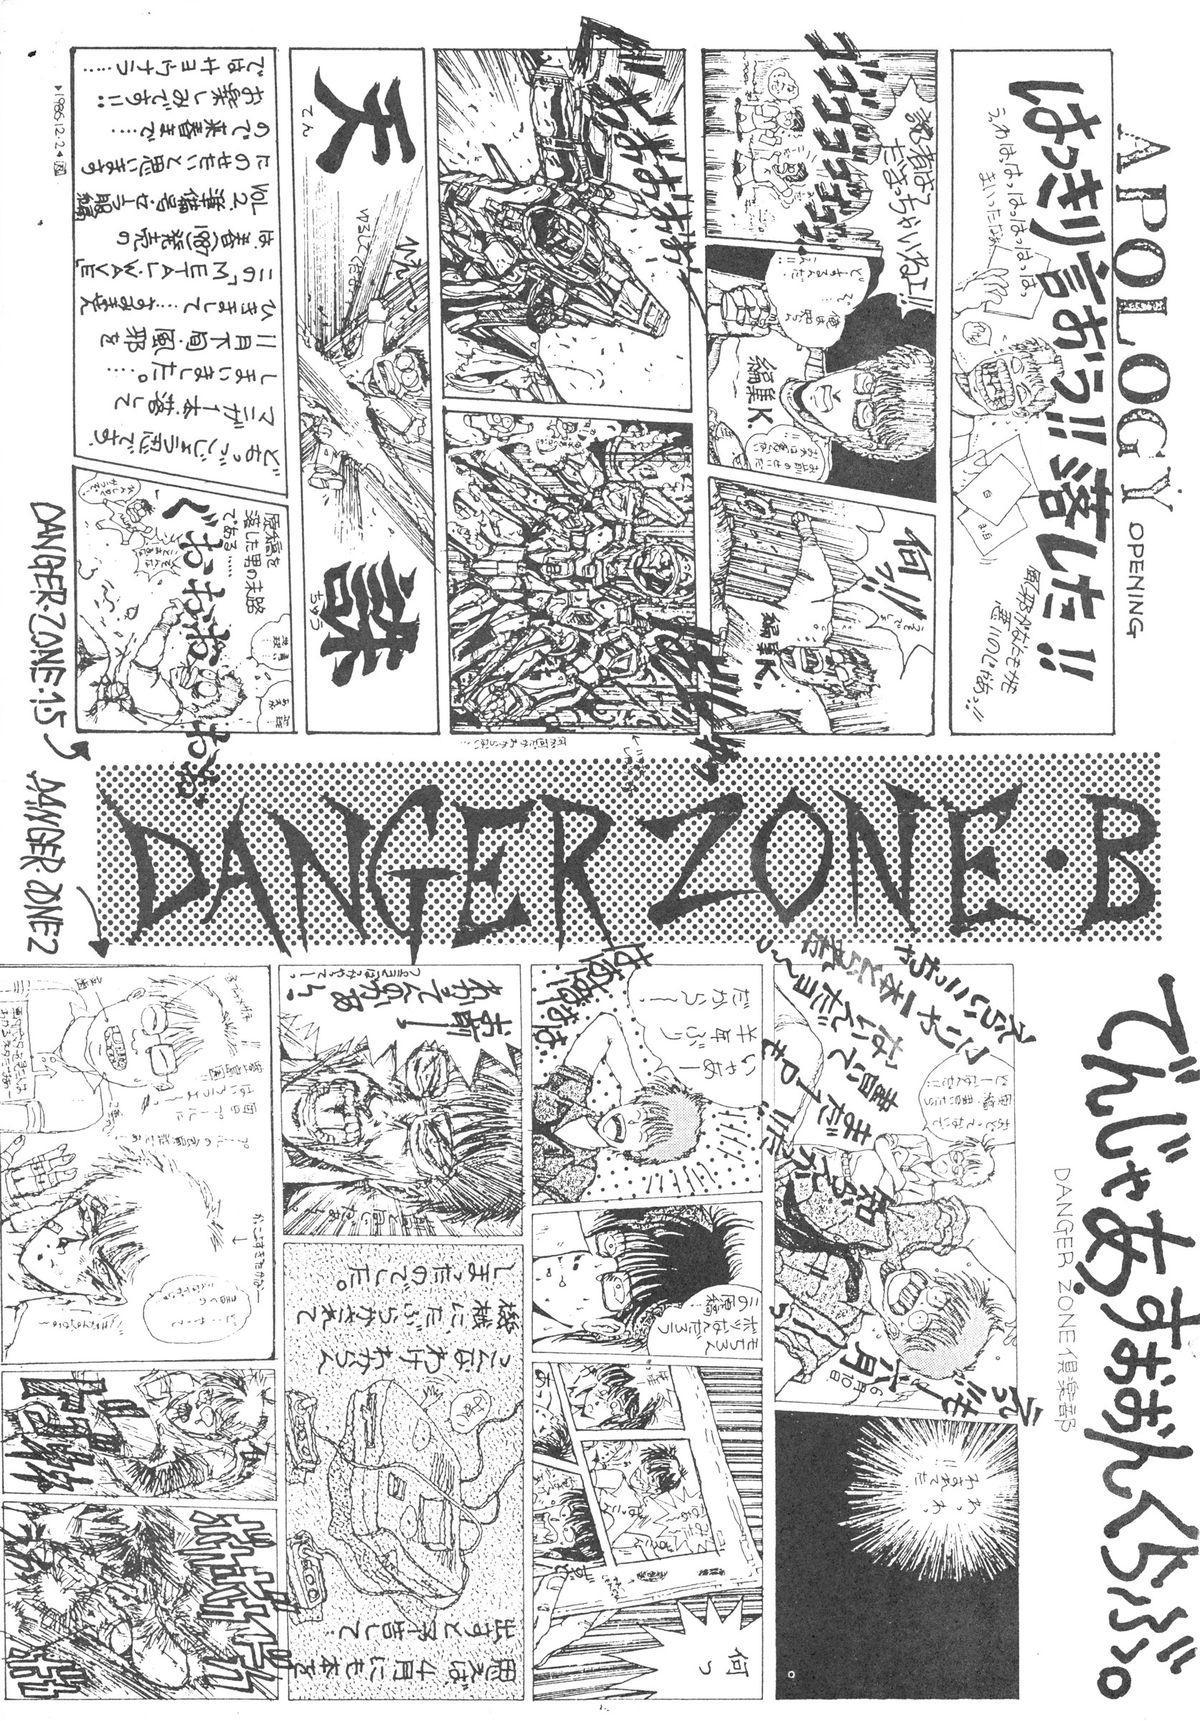 DANGER ZONE SIDE B Kairyouban 1